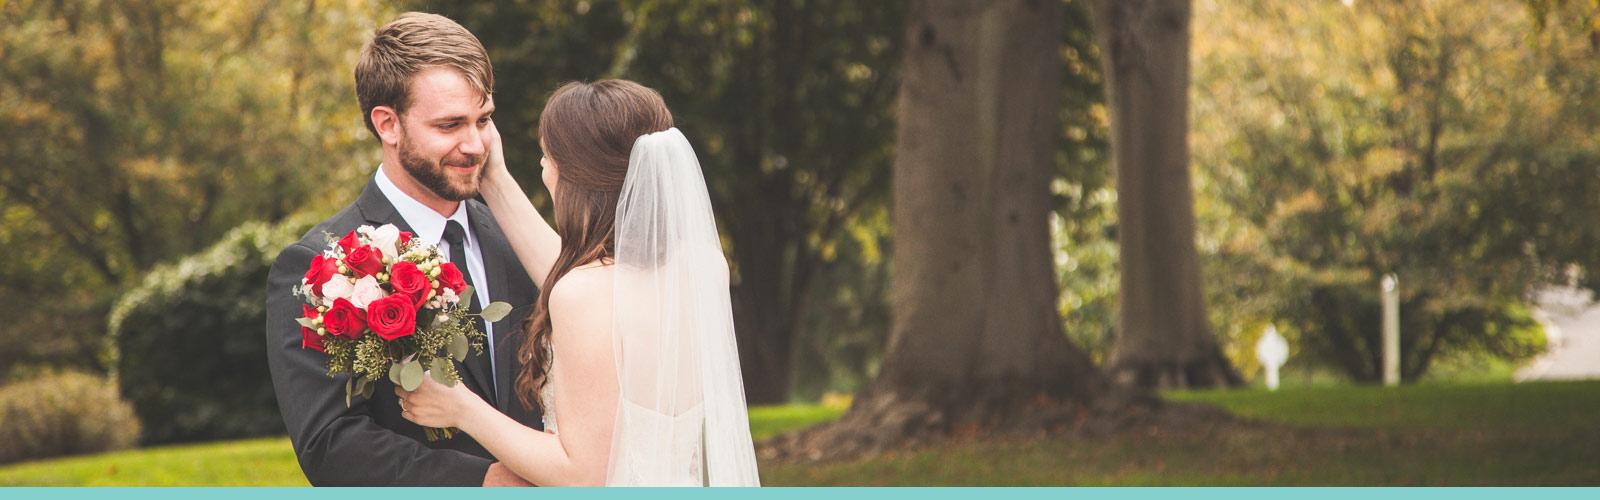 blog-2018-weddingitinerary2.jpg